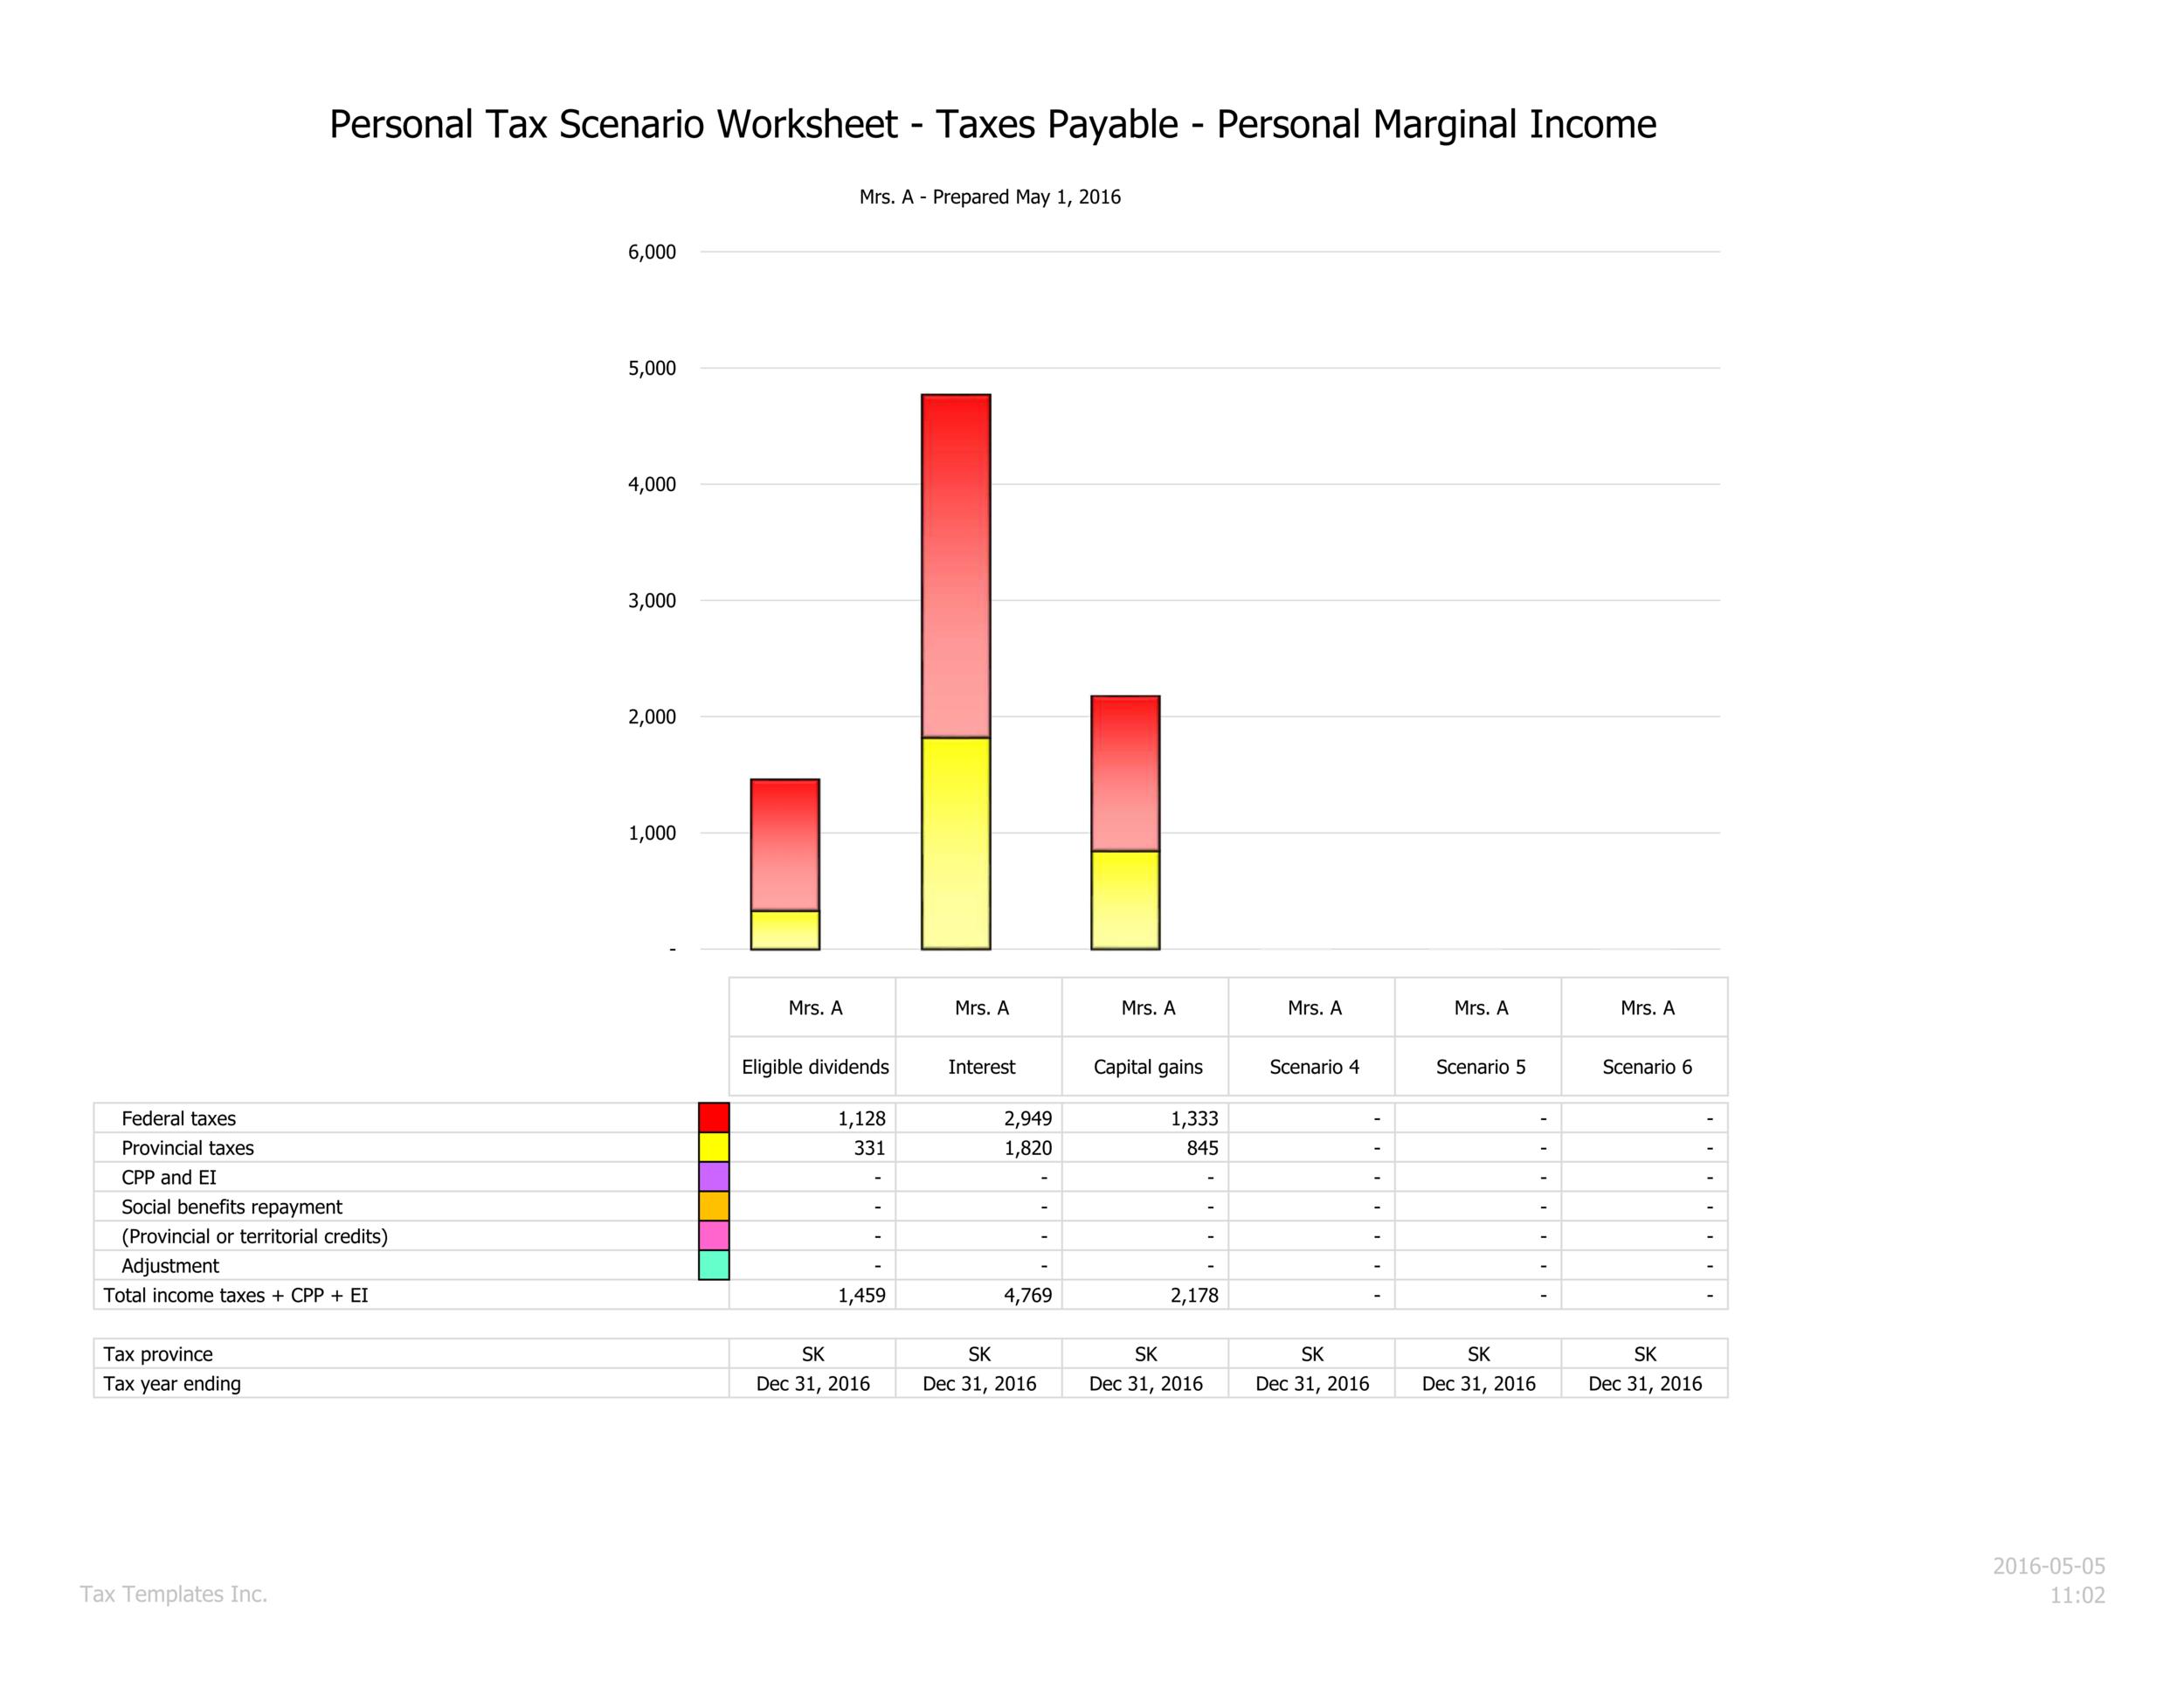 Net tax summary